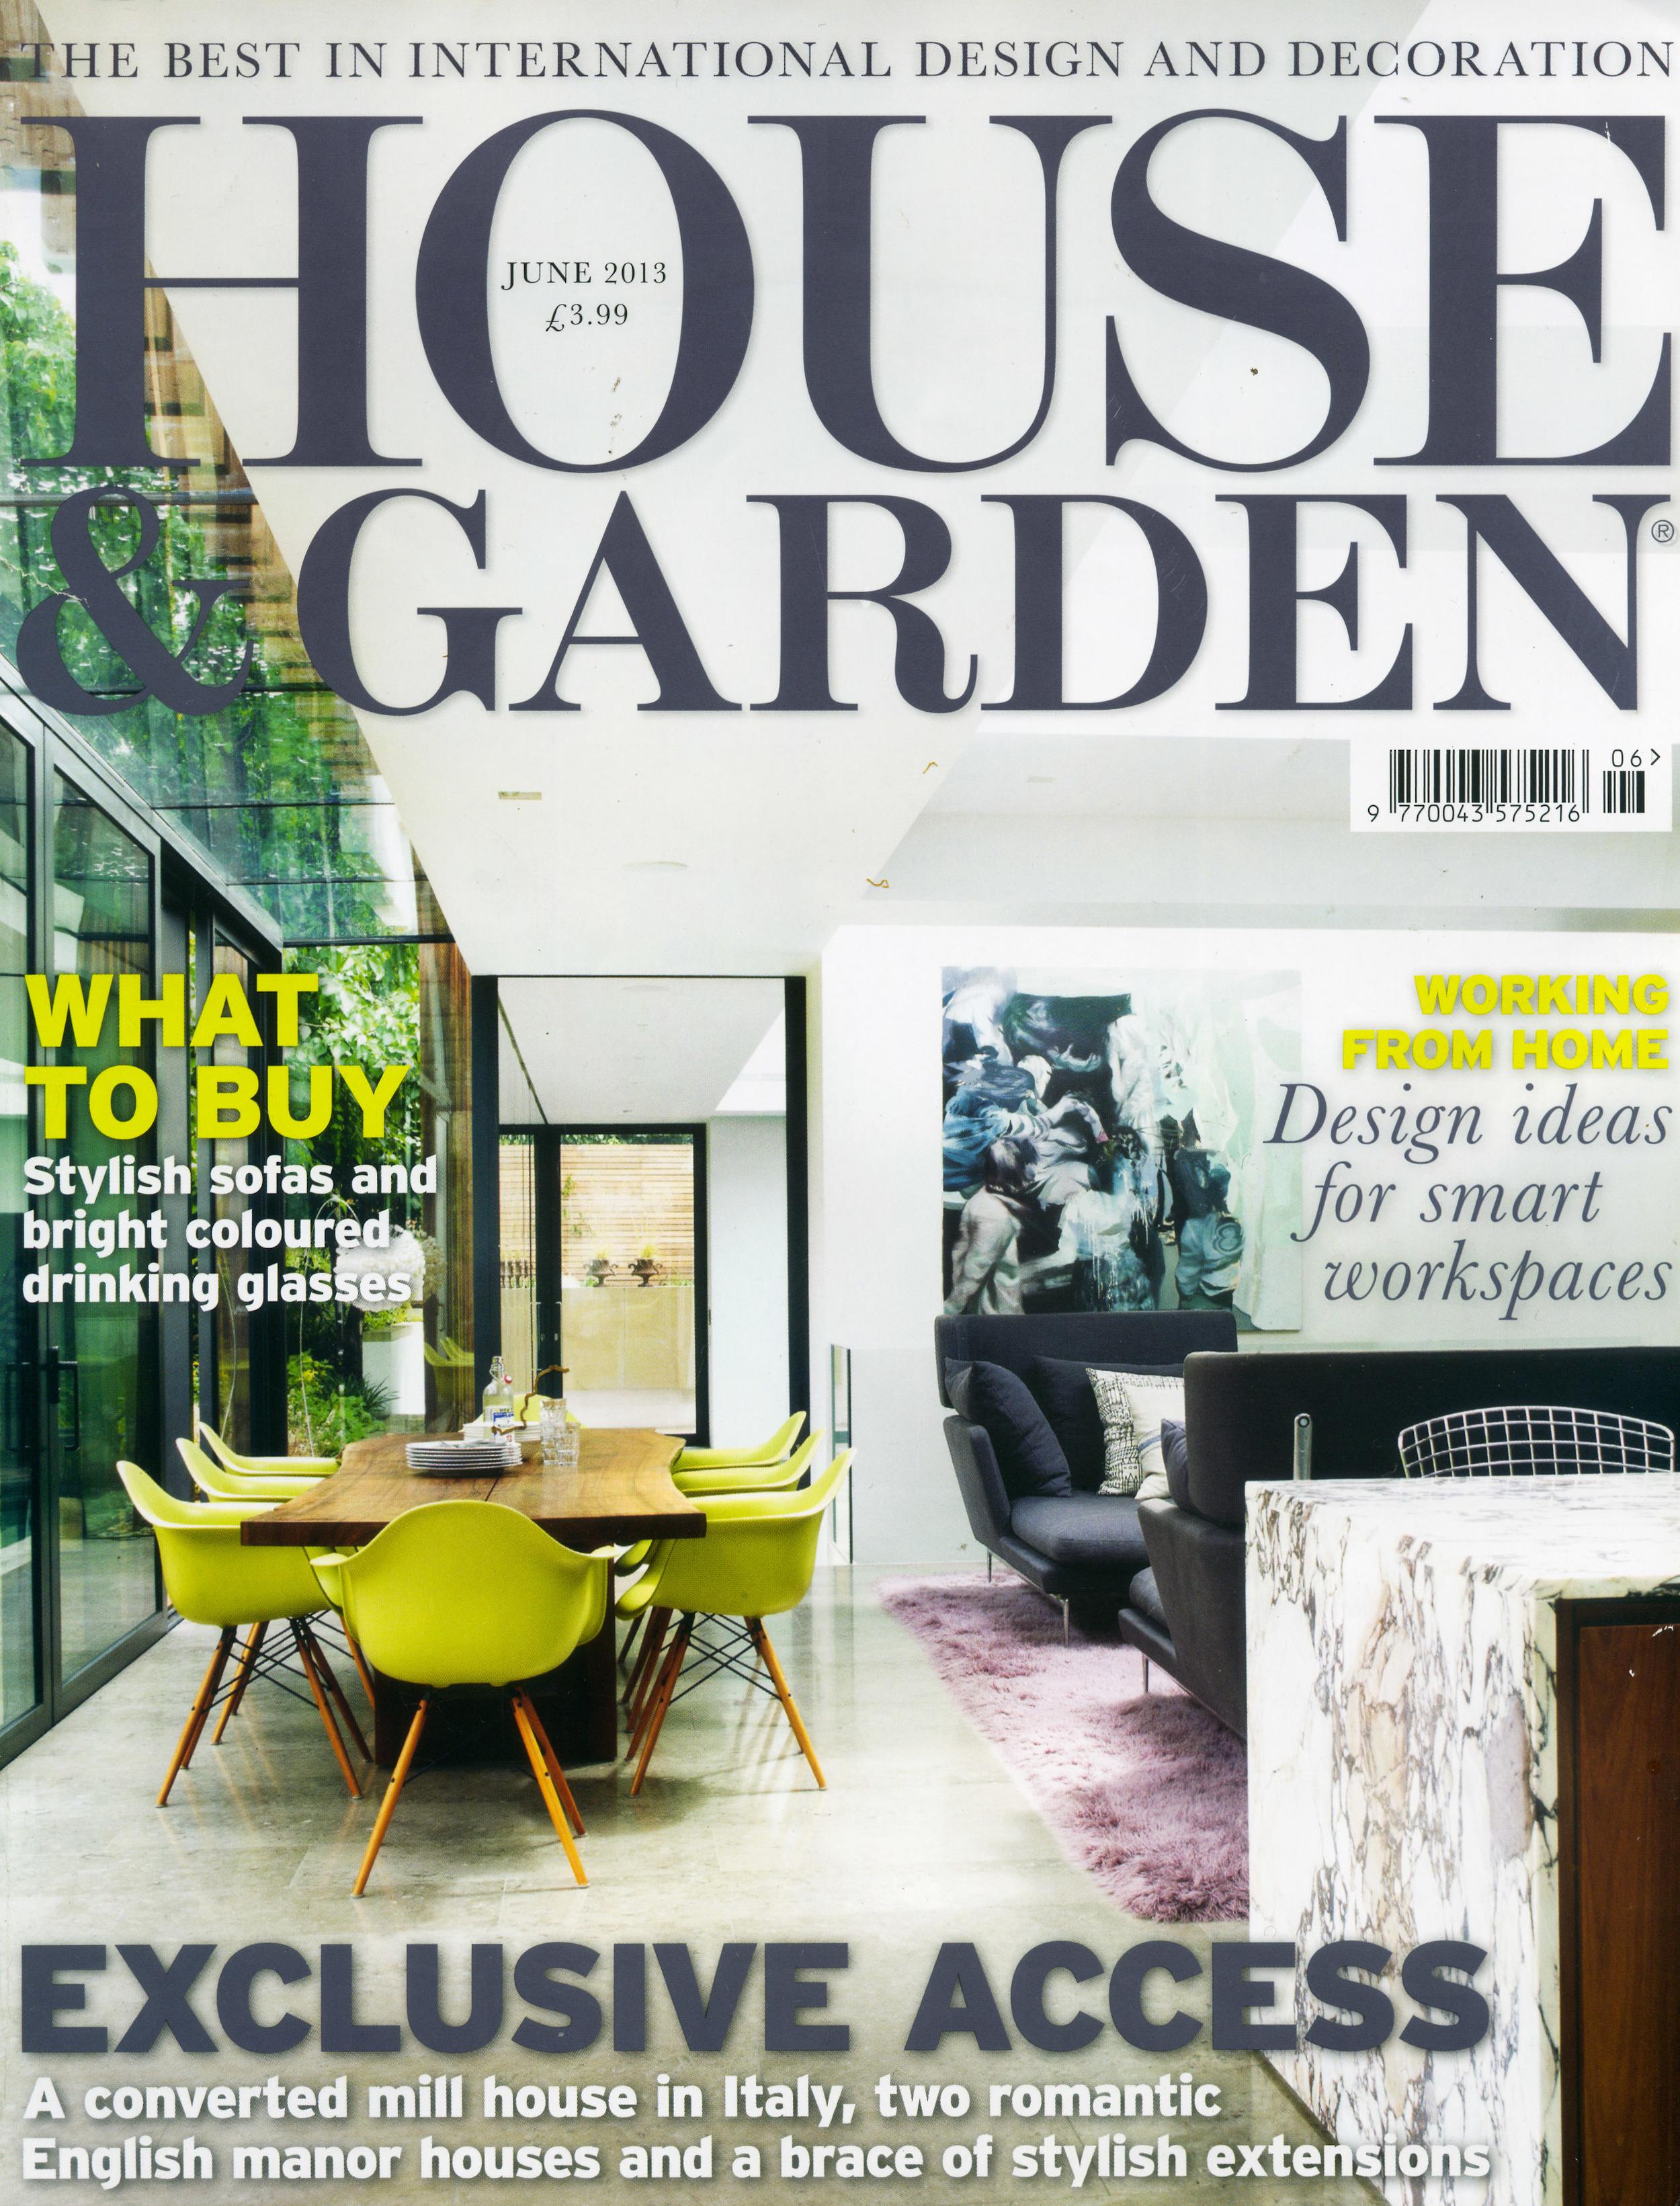 HOUSE_GARDEN-1.jpg